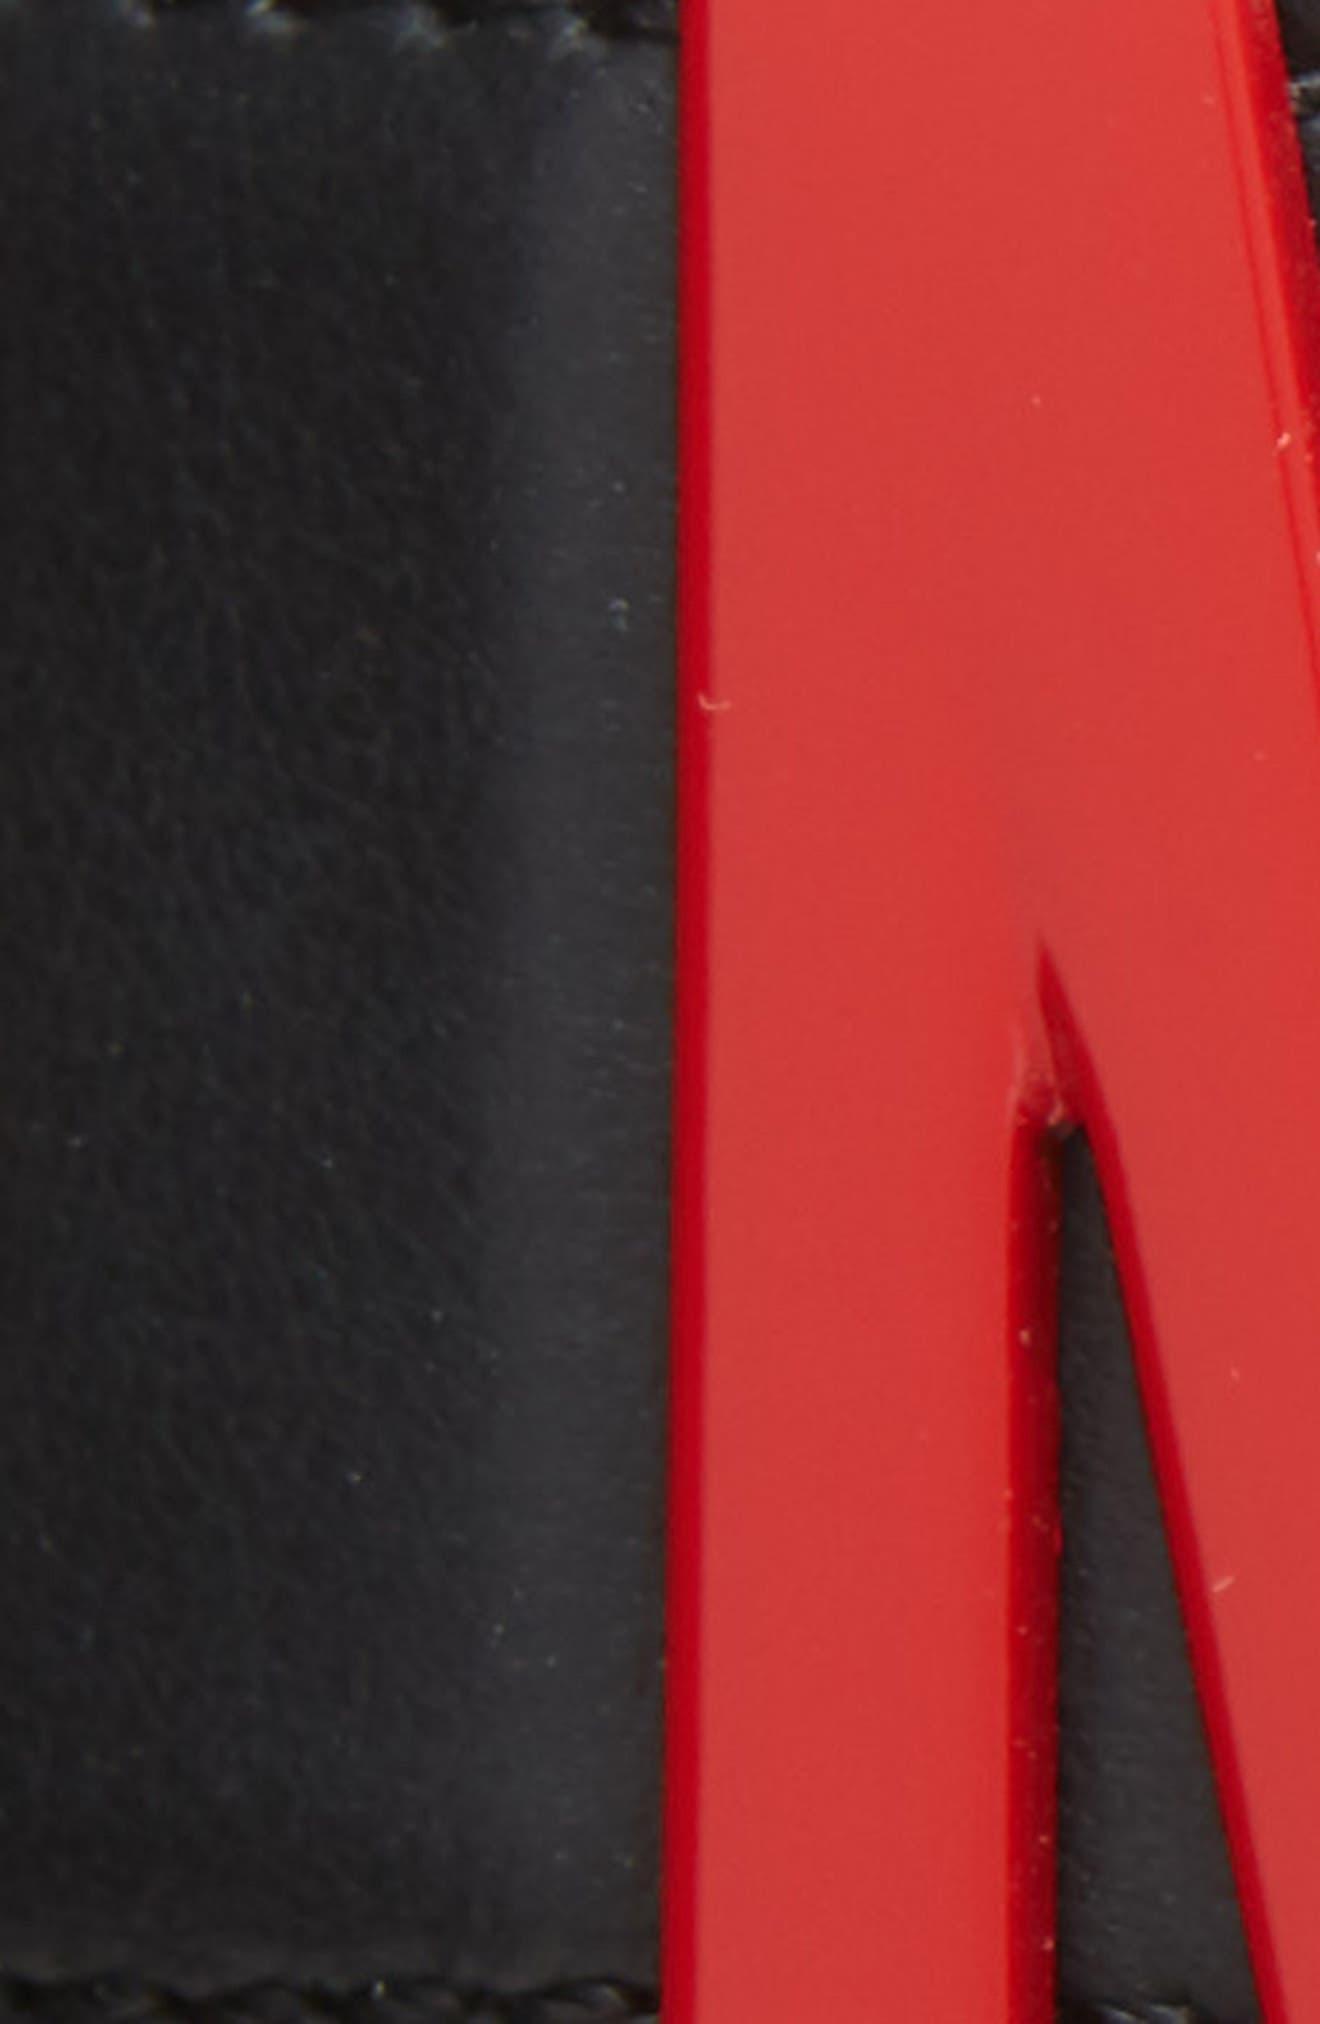 MOSCHINO,                             Logo Plaque & Grommet Belt,                             Alternate thumbnail 3, color,                             MULTI